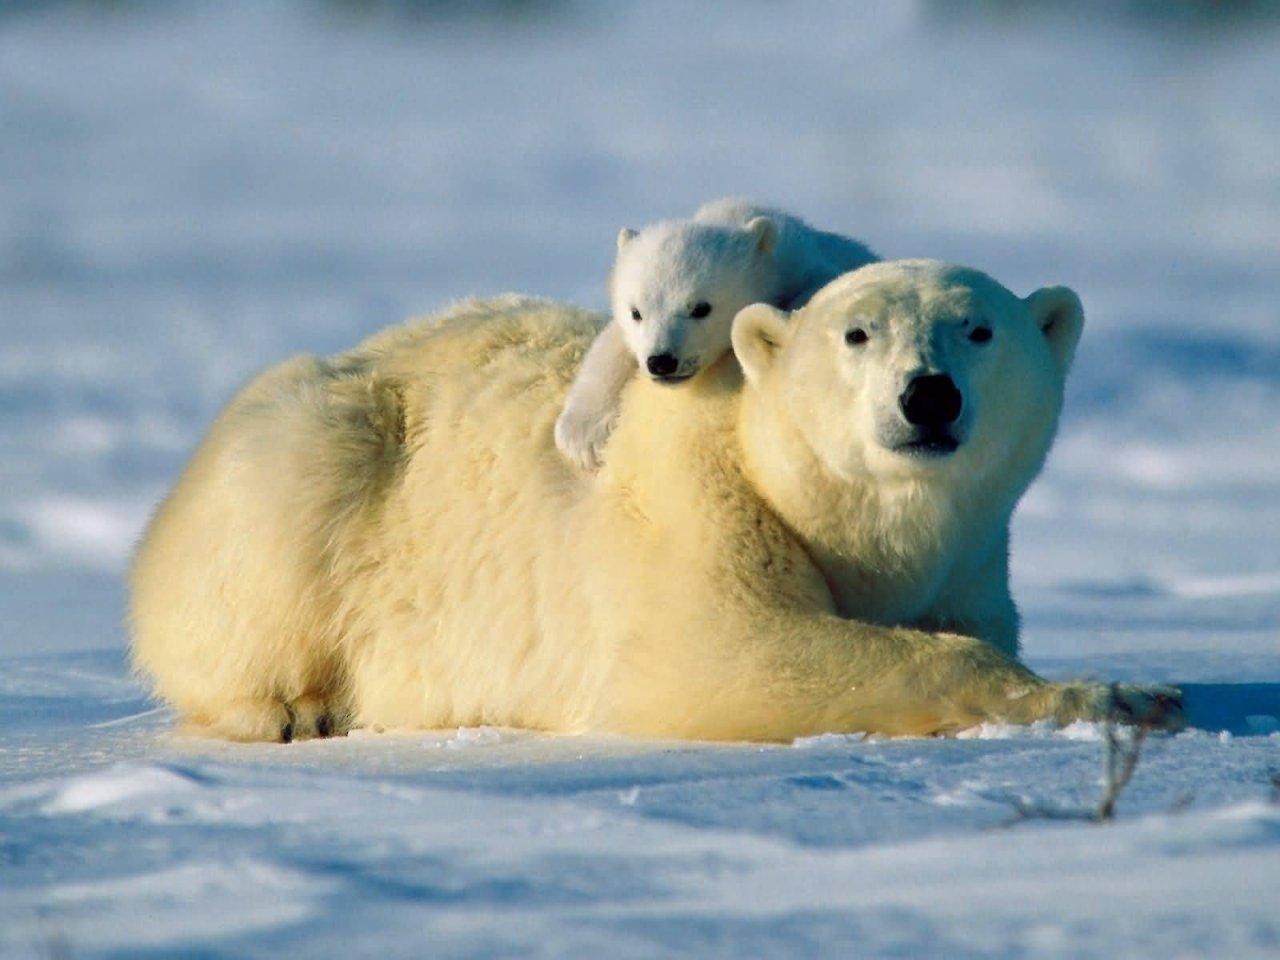 Polar Bears Gt Facts Eat Baby Population Endangered Global Warming Extinction